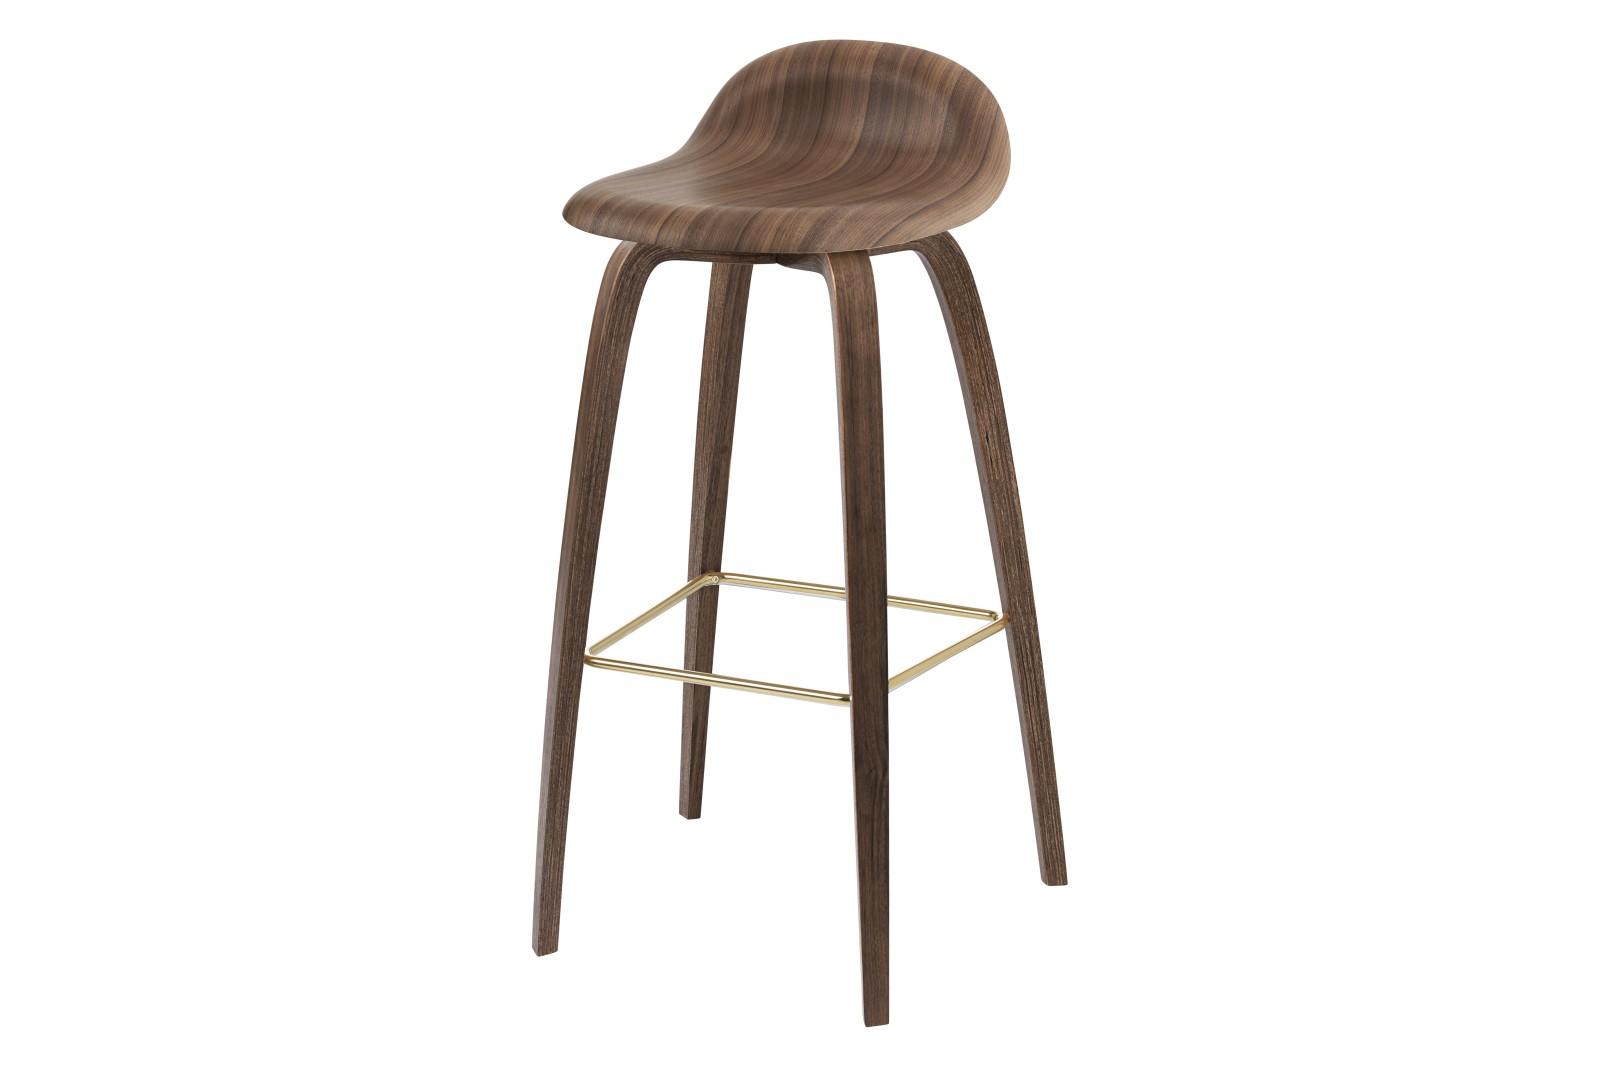 3D Bar Stool - Un-Upholstered, Wood Base Gubi Wood American Walnut, Gubi Wood American Walnut, Gubi